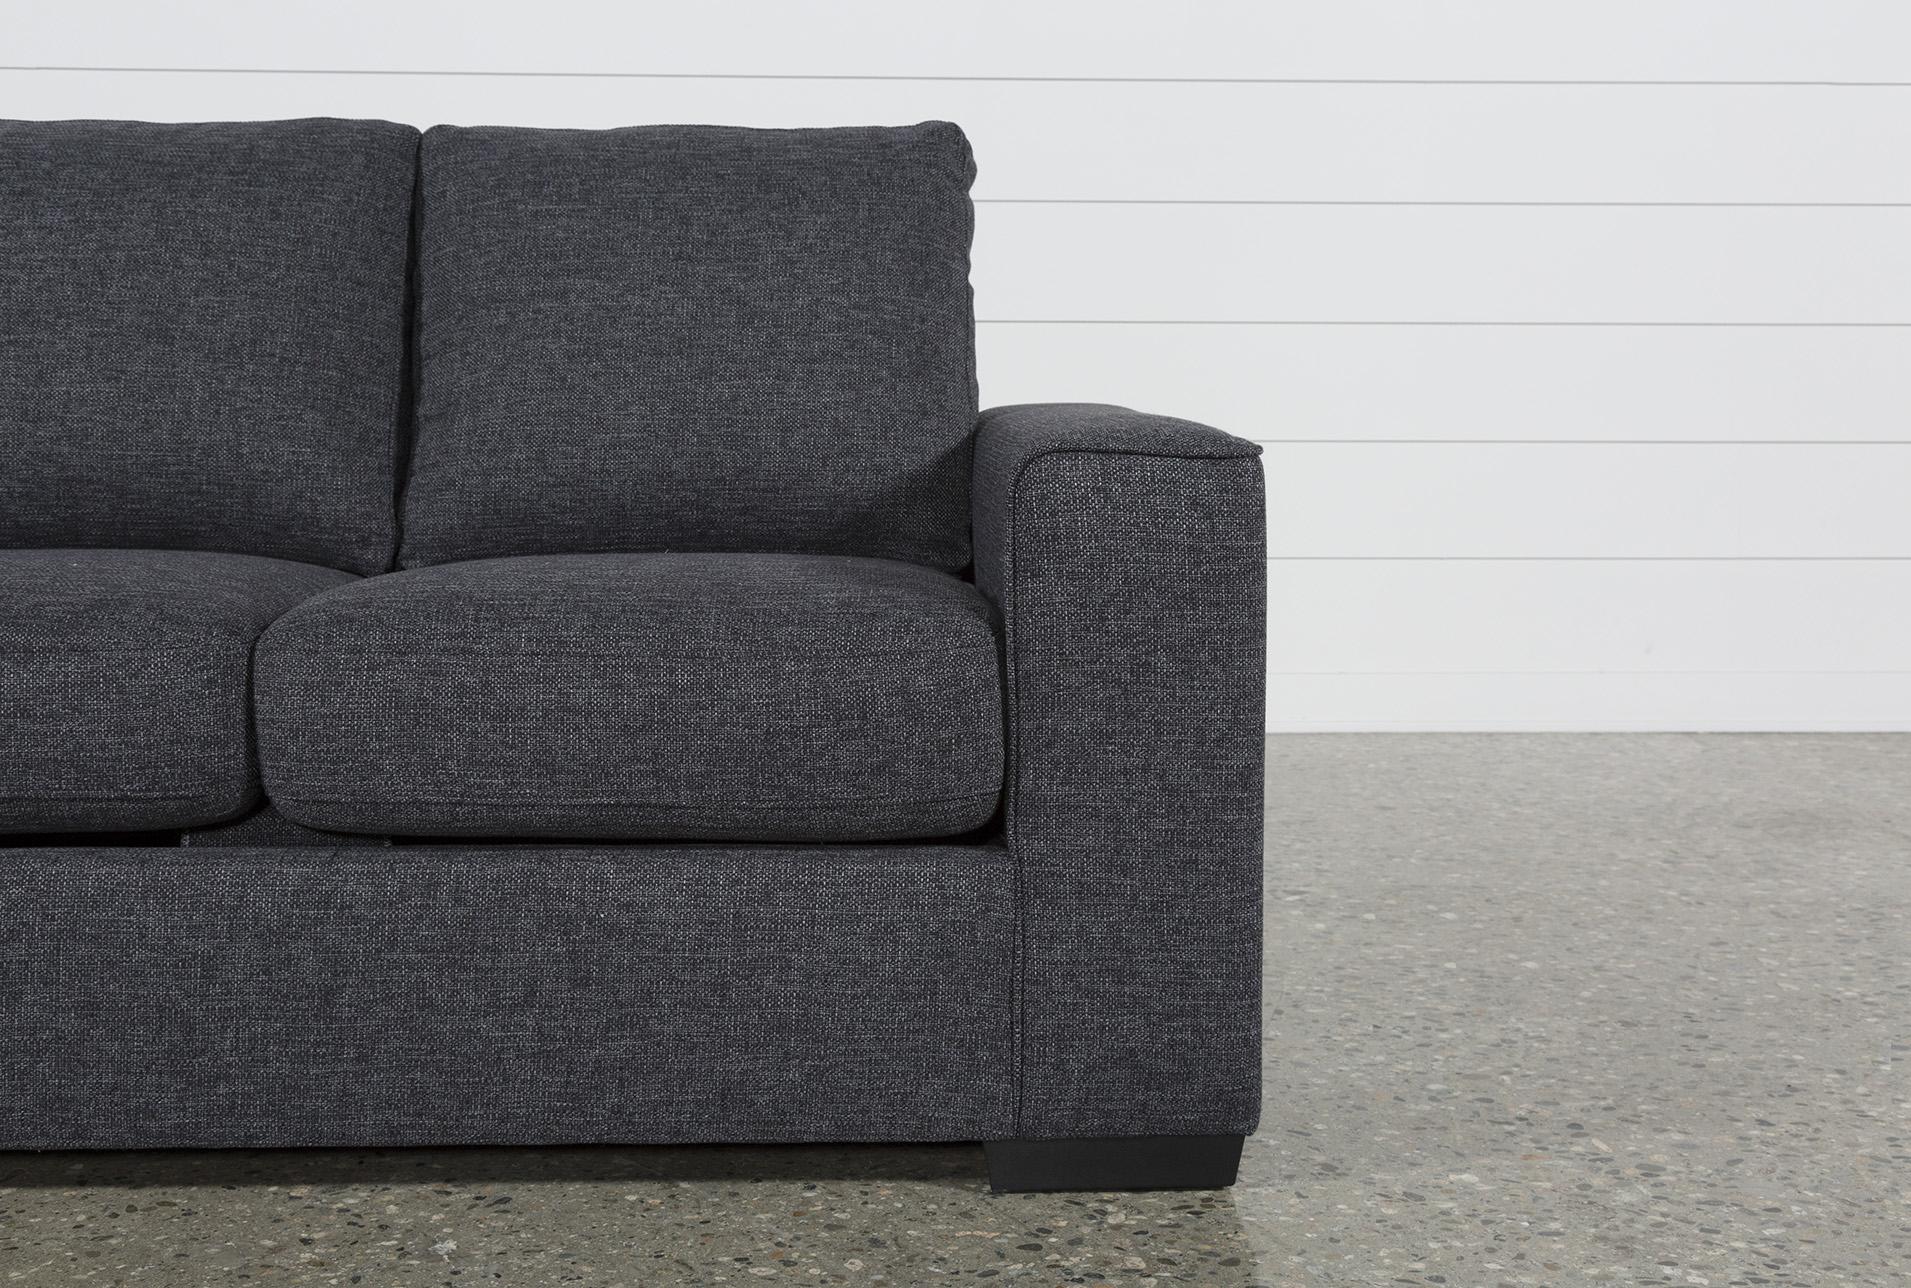 Lucy Dark Grey Queen Sleeper | Products | Pinterest | Dark Grey And Throughout Lucy Dark Grey Sofa Chairs (View 6 of 25)